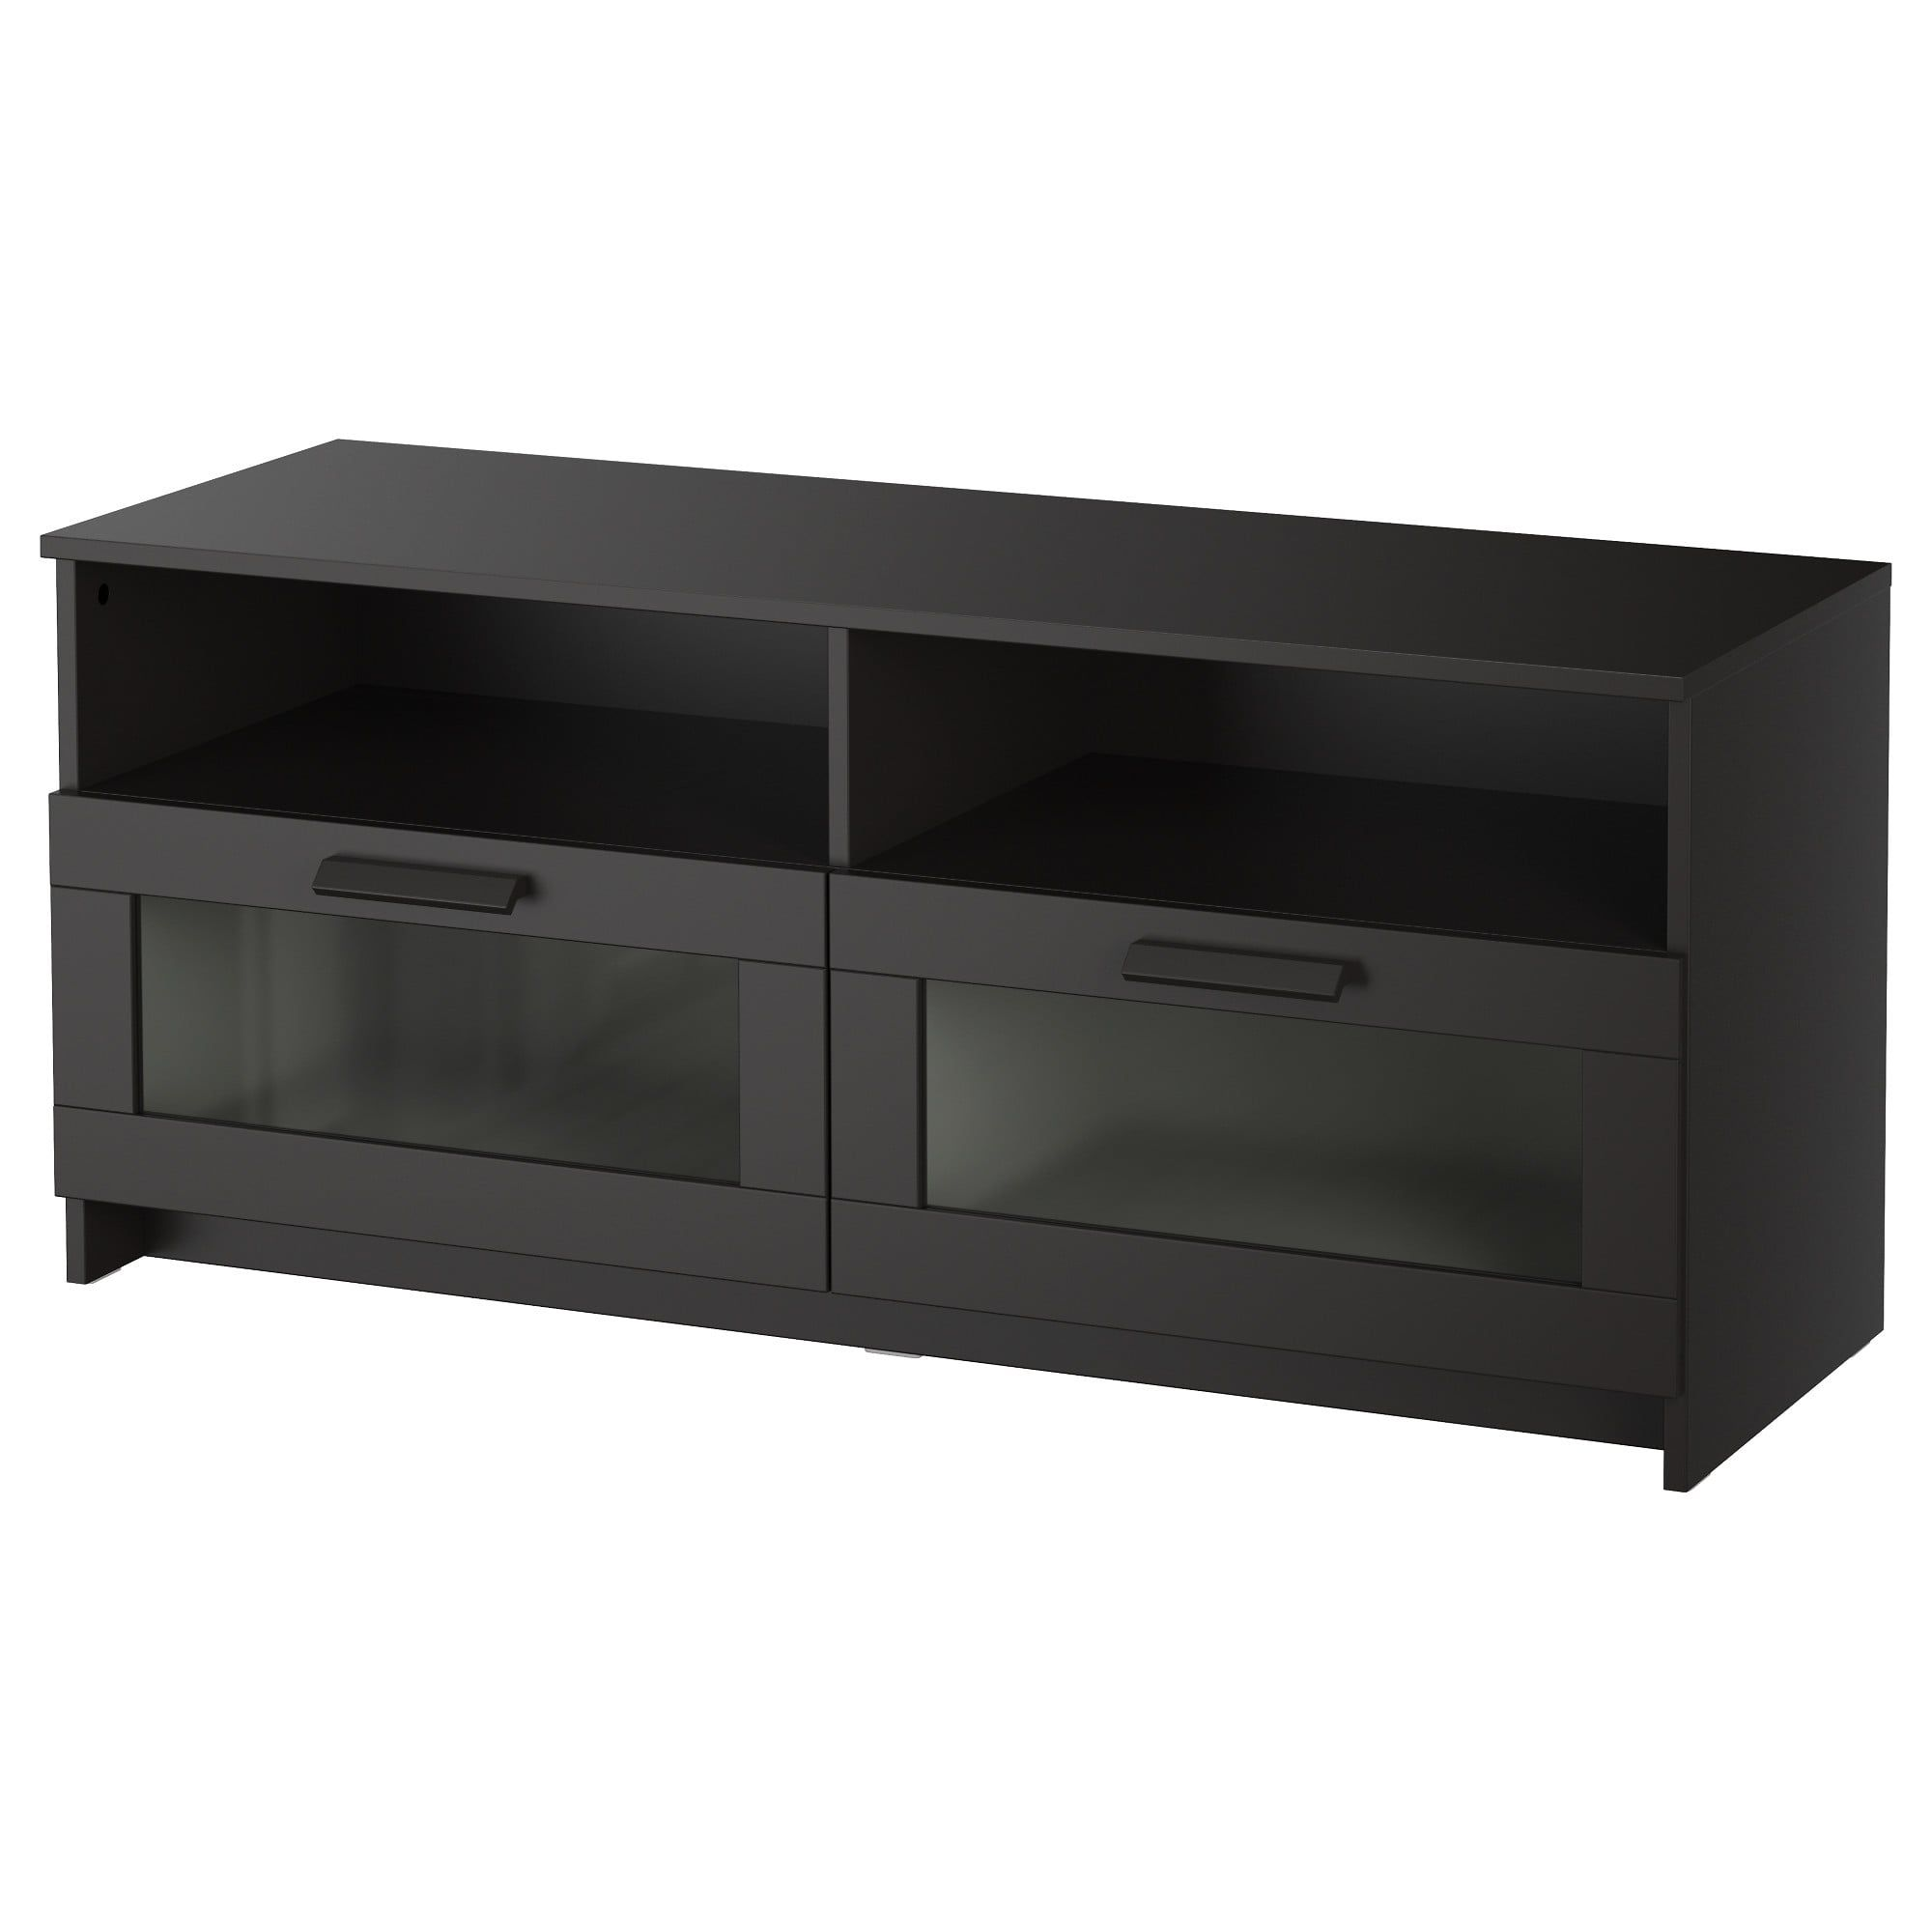 Brimnes Tv Bench Black Official Website Ikea Ikea Tv Ikea Tv Stand Brimnes